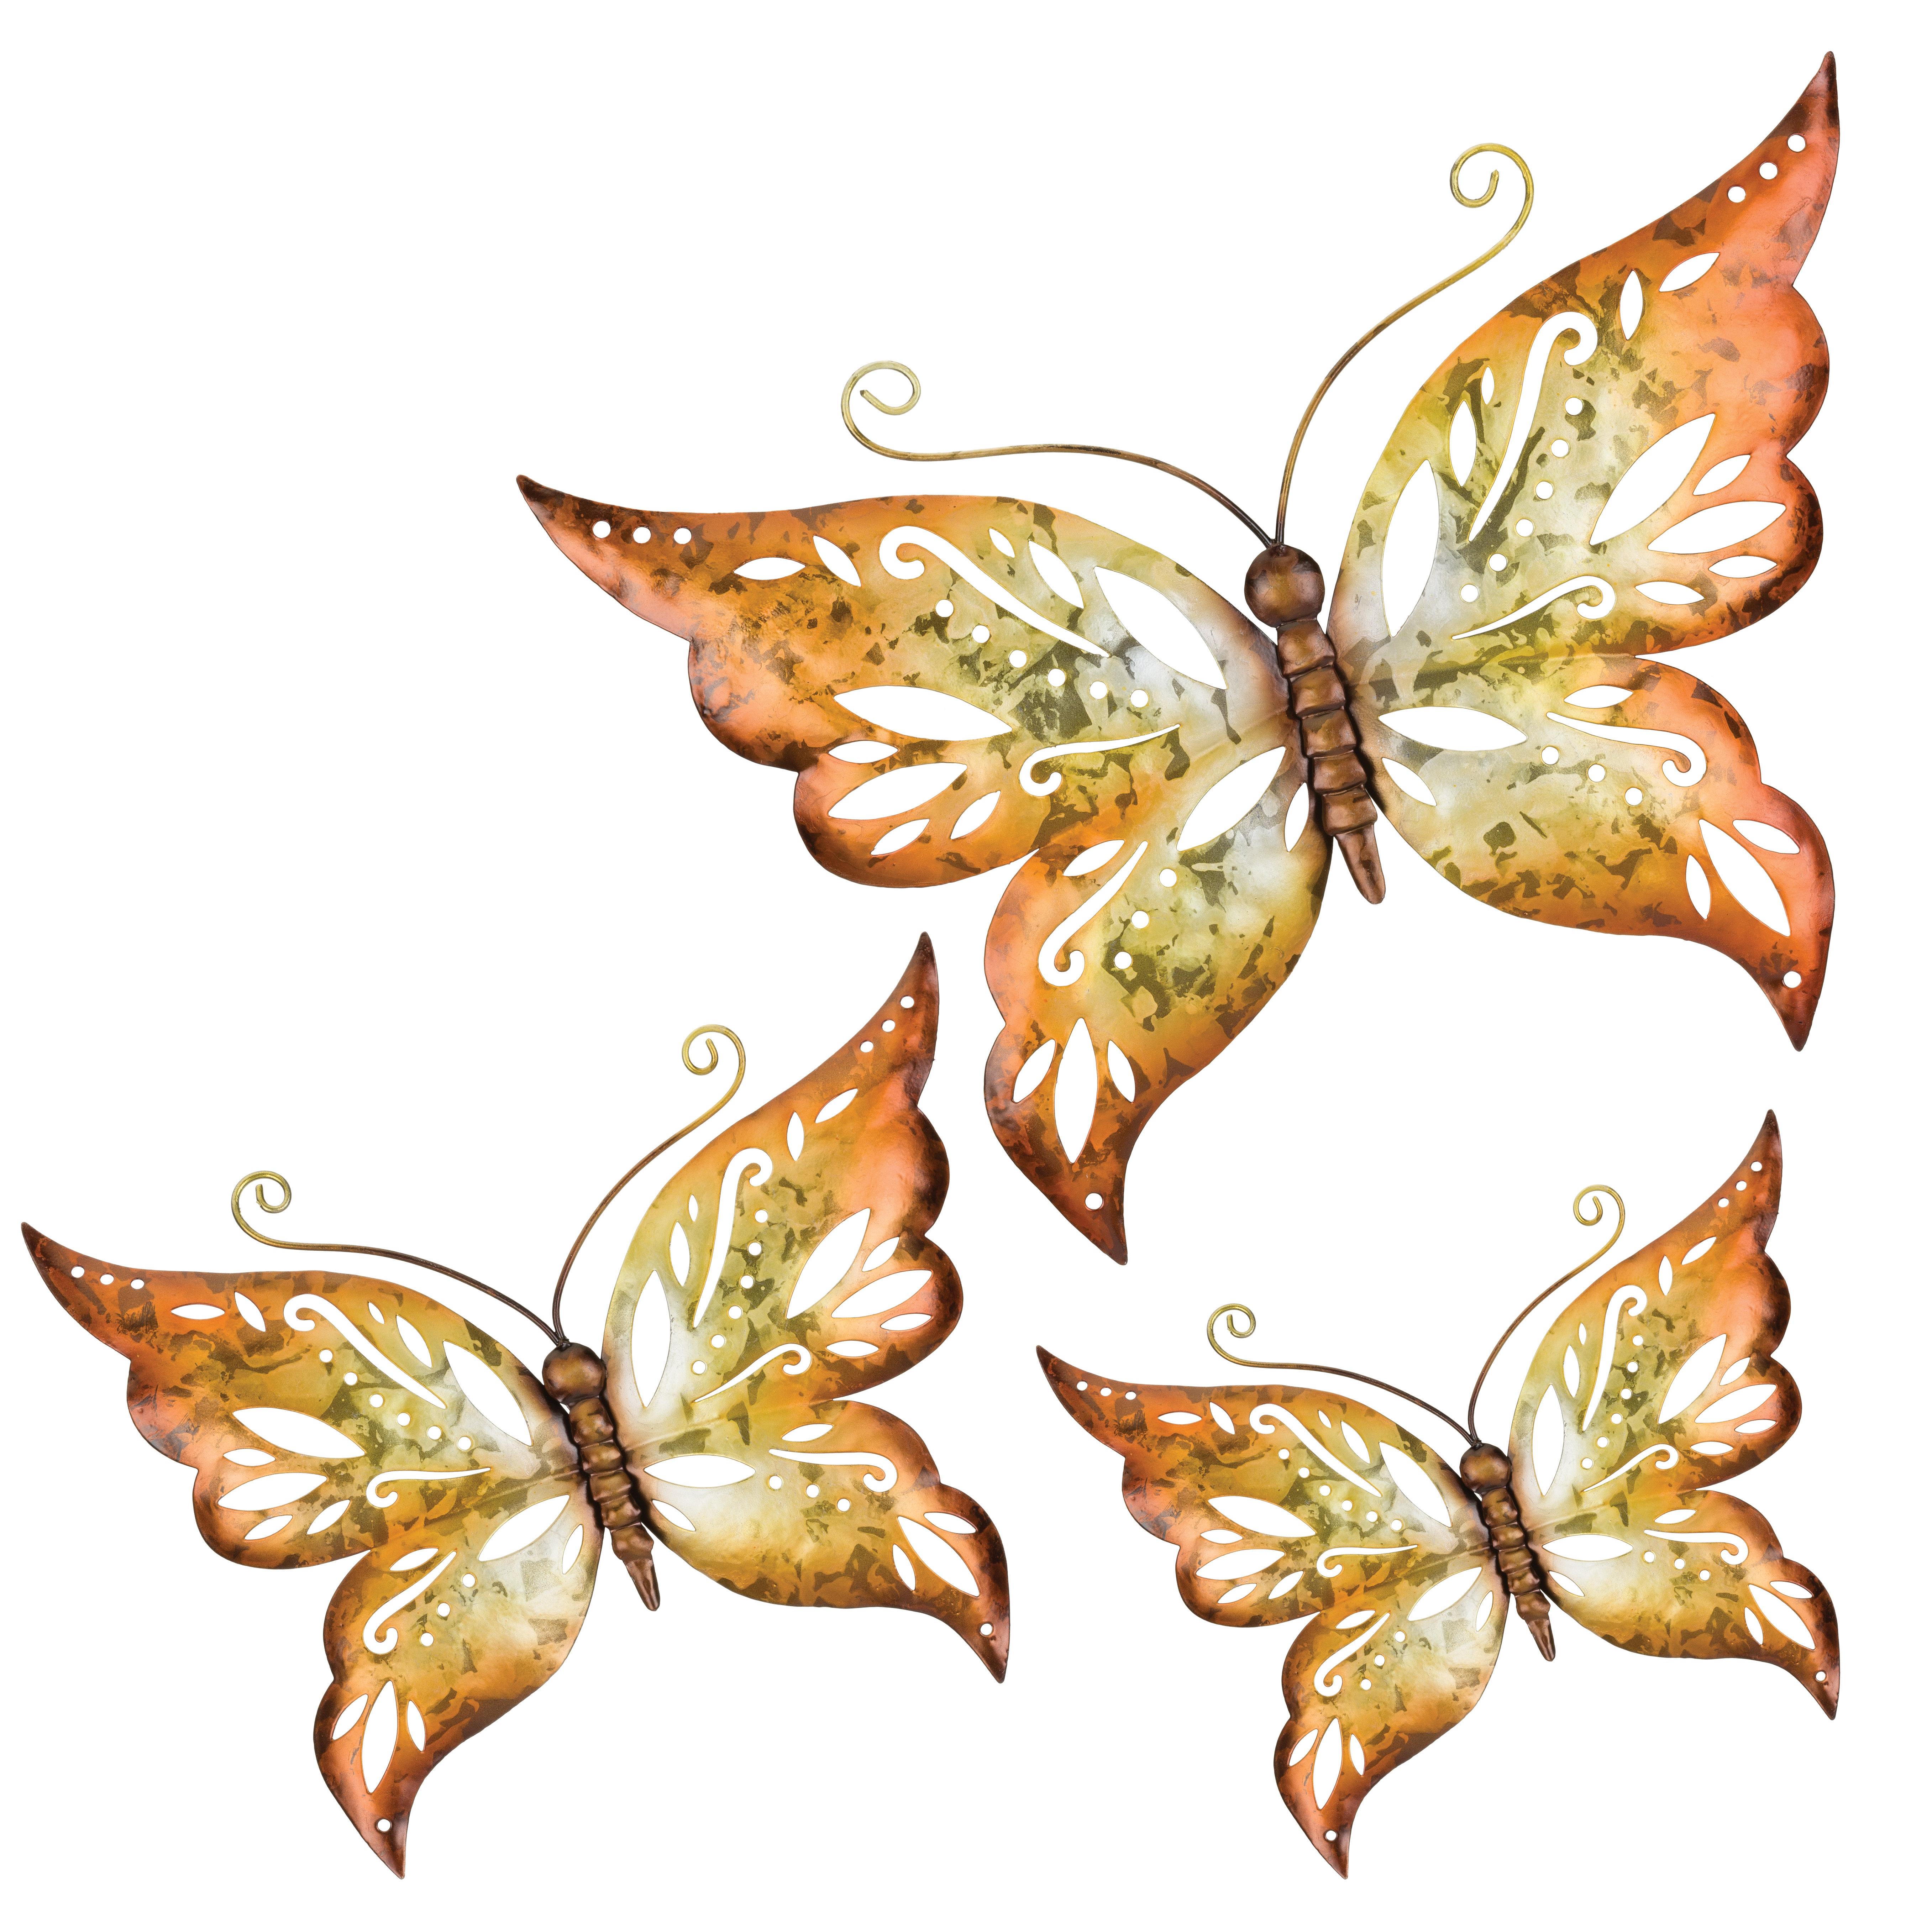 2019 Regal Art & Gift 3 Piece Capri Butterfly Wall Décor Set & Reviews Throughout 3 Piece Capri Butterfly Wall Decor Sets (Gallery 1 of 20)